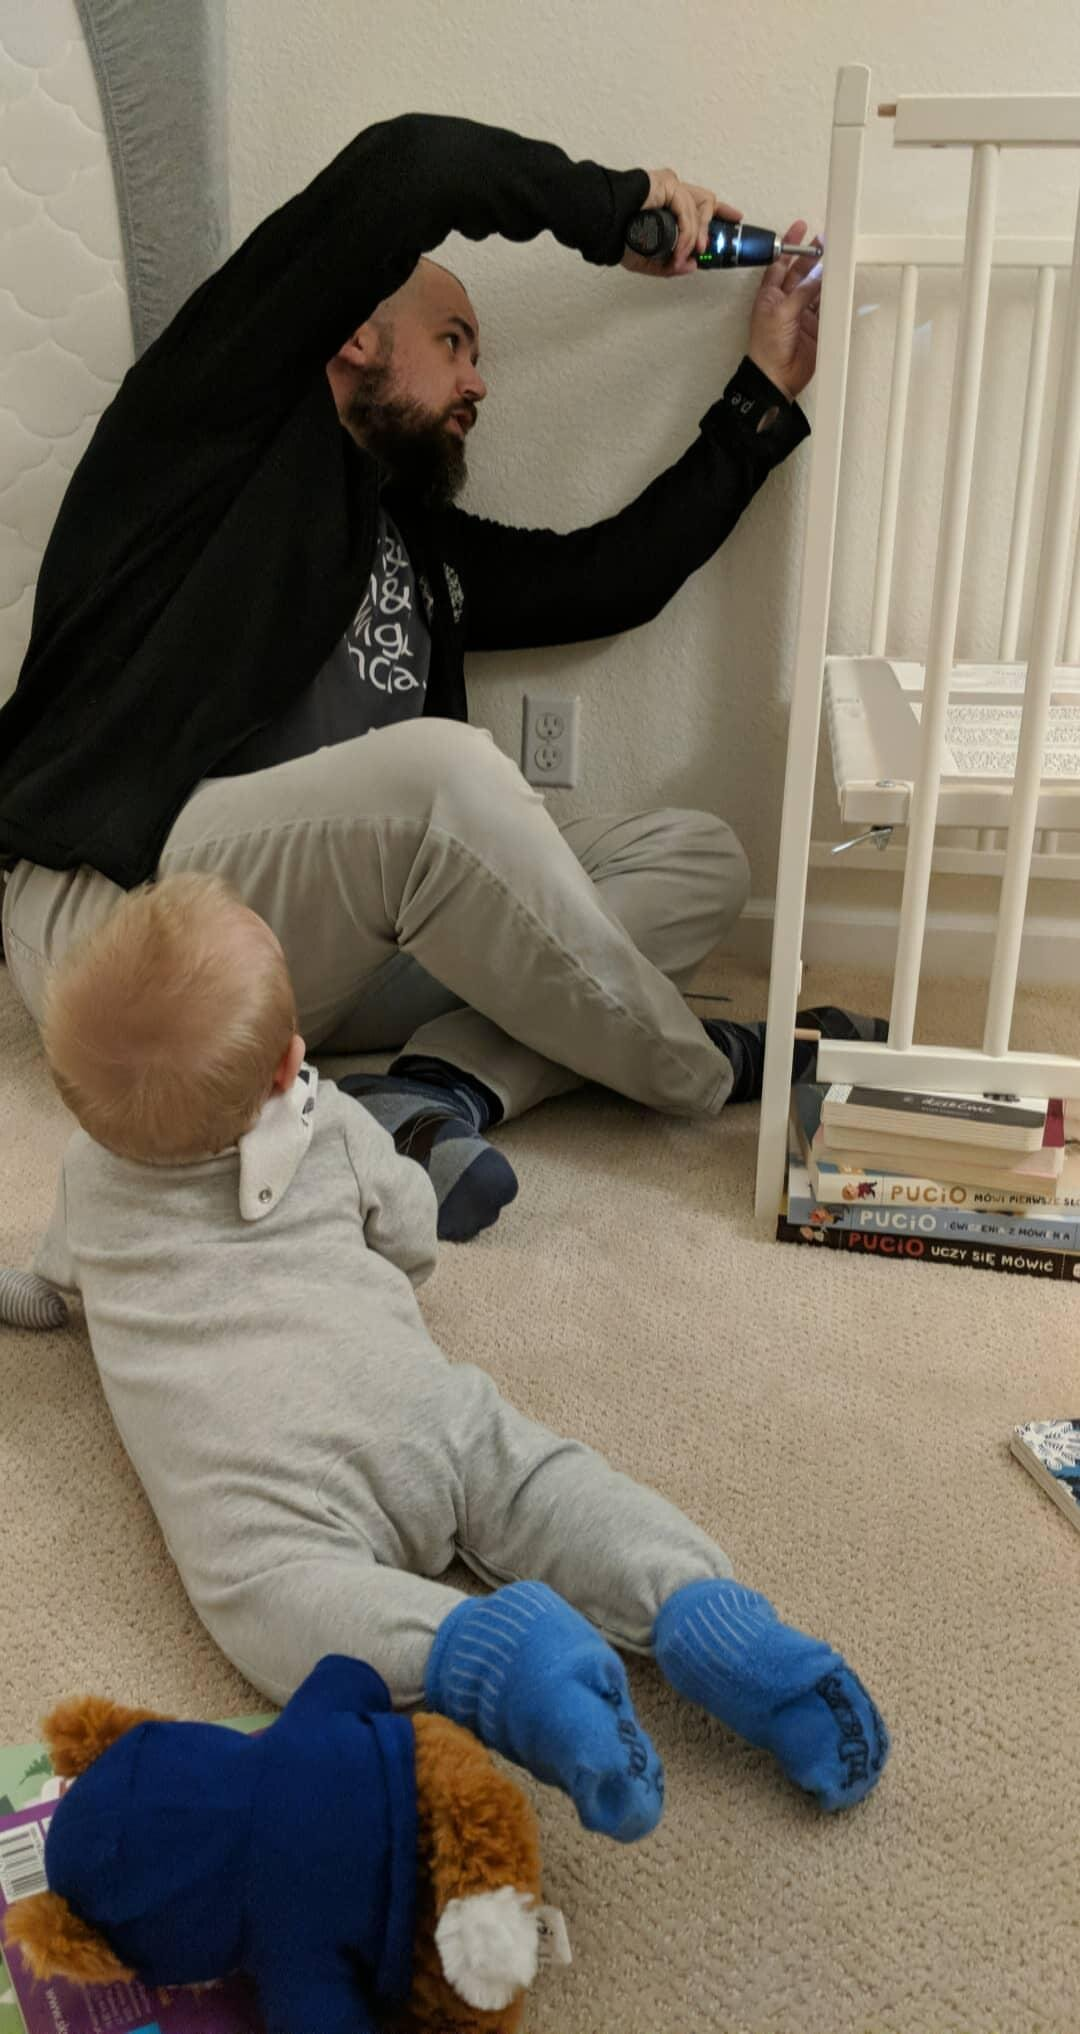 Installing the Ikea crib.